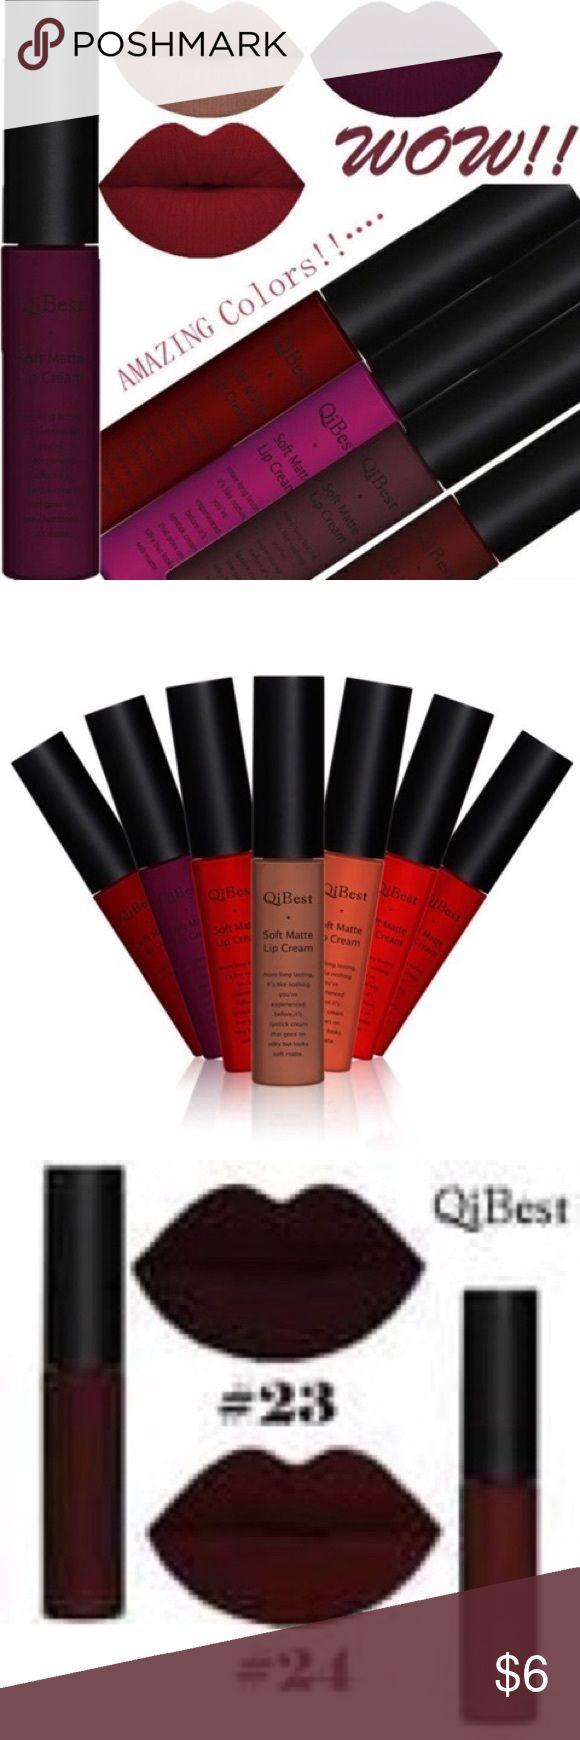 Soft matter lip cream dark rouge Matter. Long lasting. Waterproof. QiBest brand. Dark rouge. Number #24. Still in original packaging. Qibest Makeup Lipstick